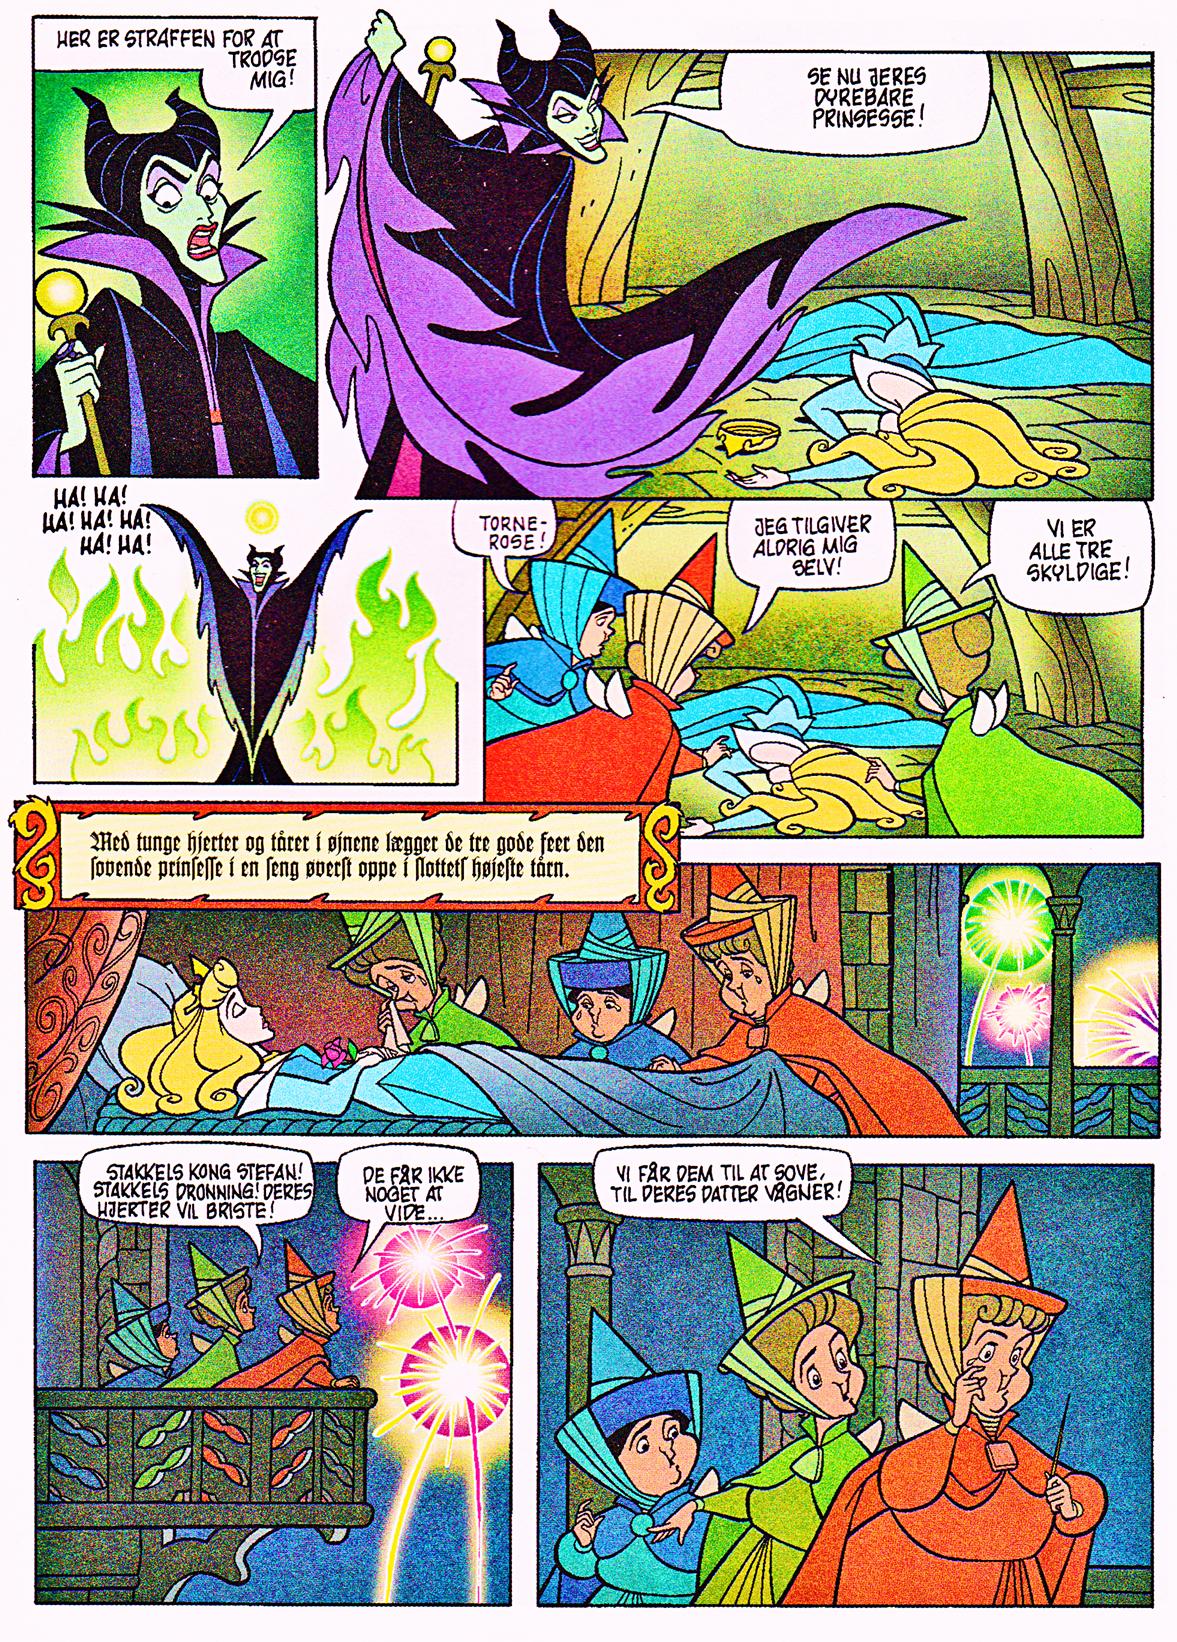 Walt Disney Movie Comics – Sleeping Beauty (Danish 1995 Version)